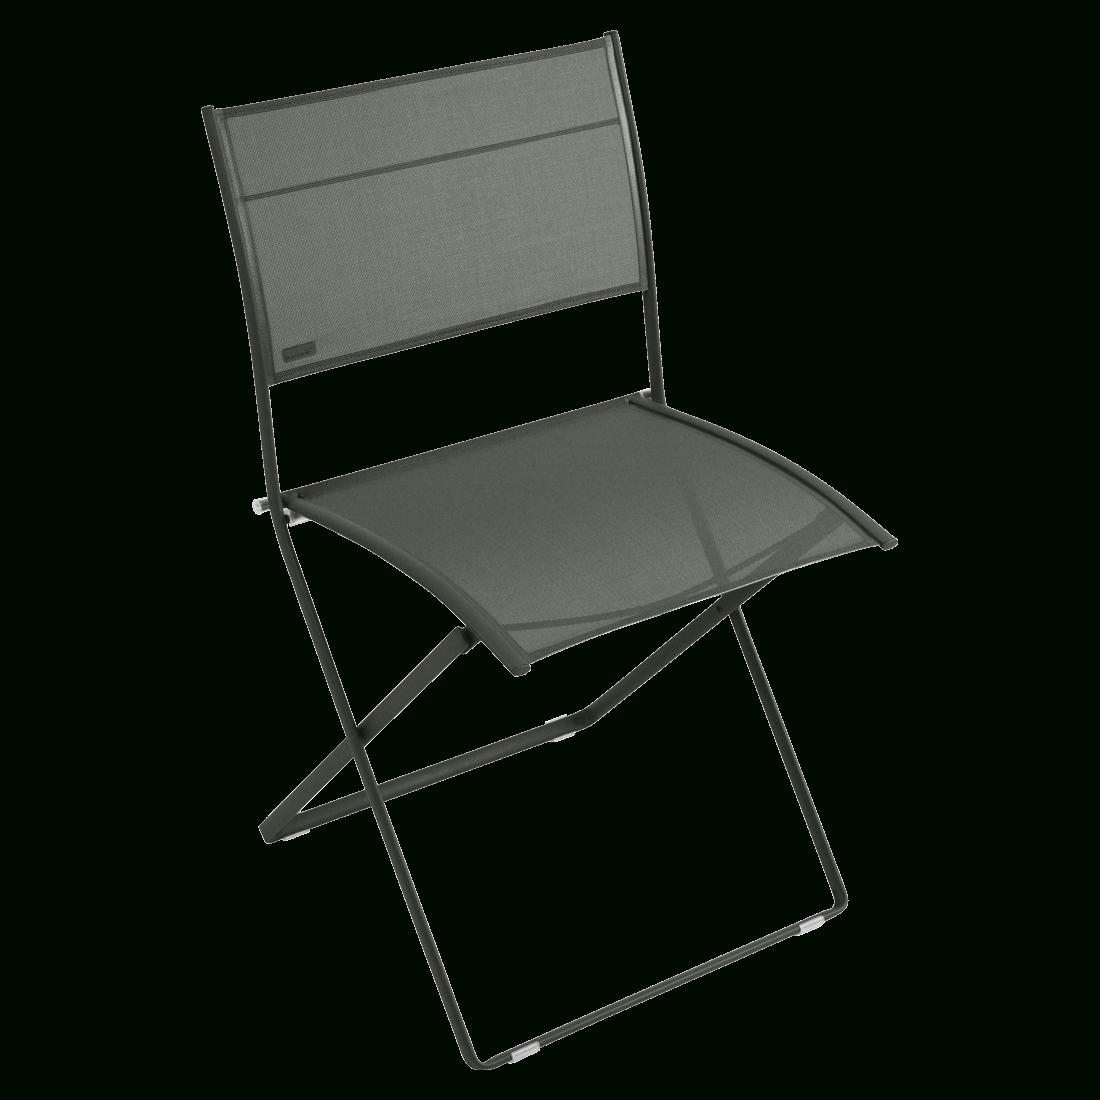 Plein Air Chair, Garden Fabric Chair (Otf) destiné Table Jardin Verte